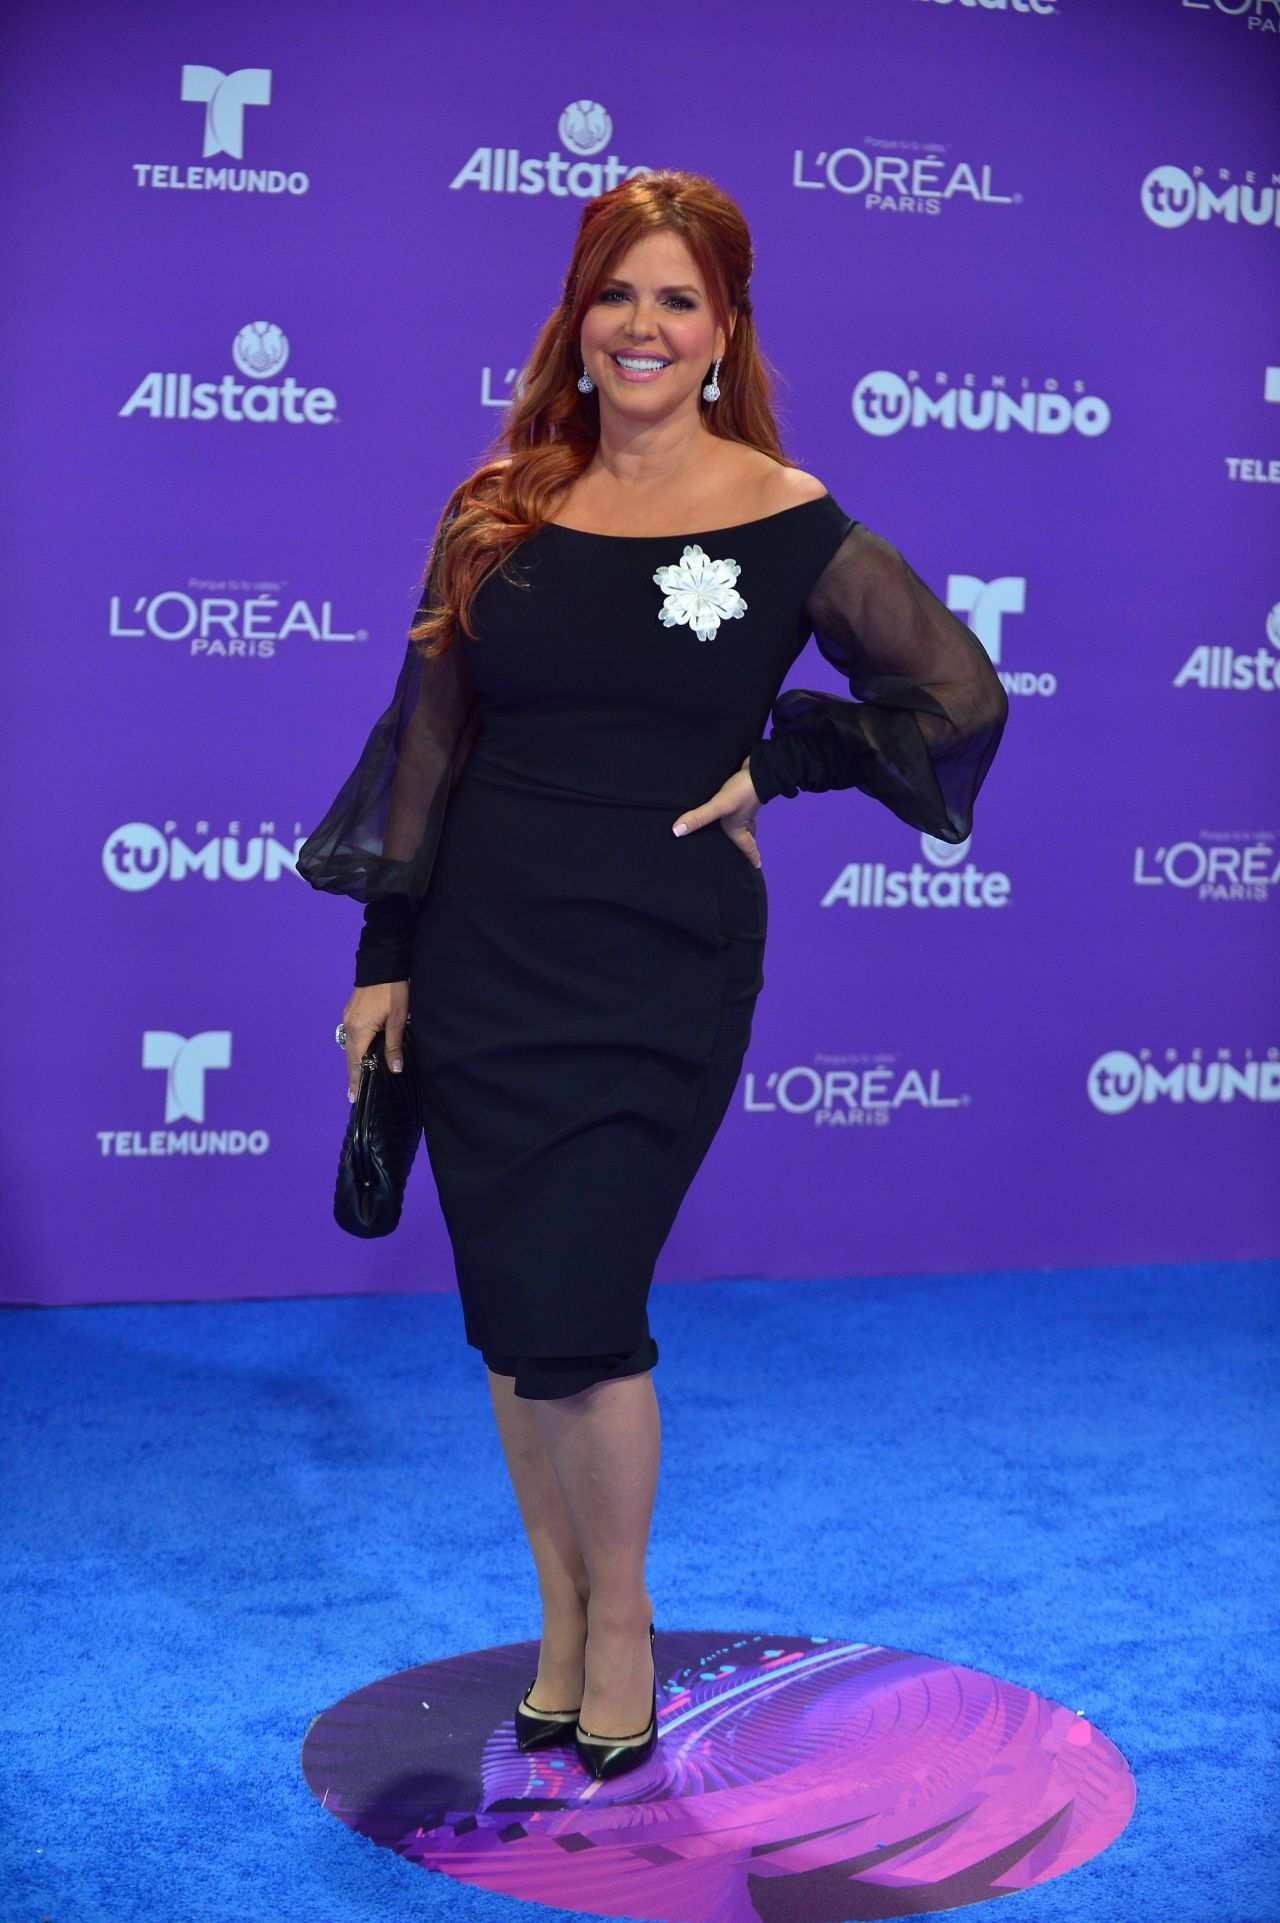 Maria Celeste Premios Tu Mundo In Miami 08 24 2017